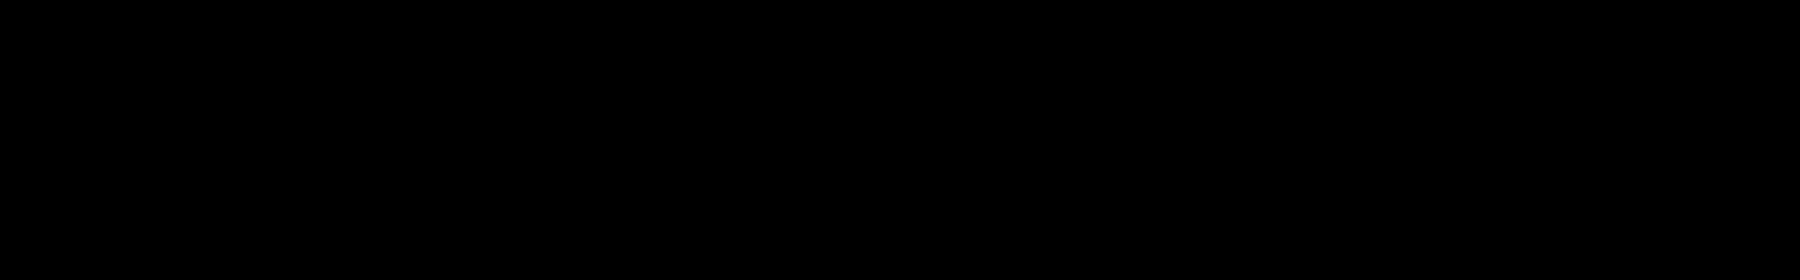 Joe Garston Essential Sylenth1 Presets audio waveform